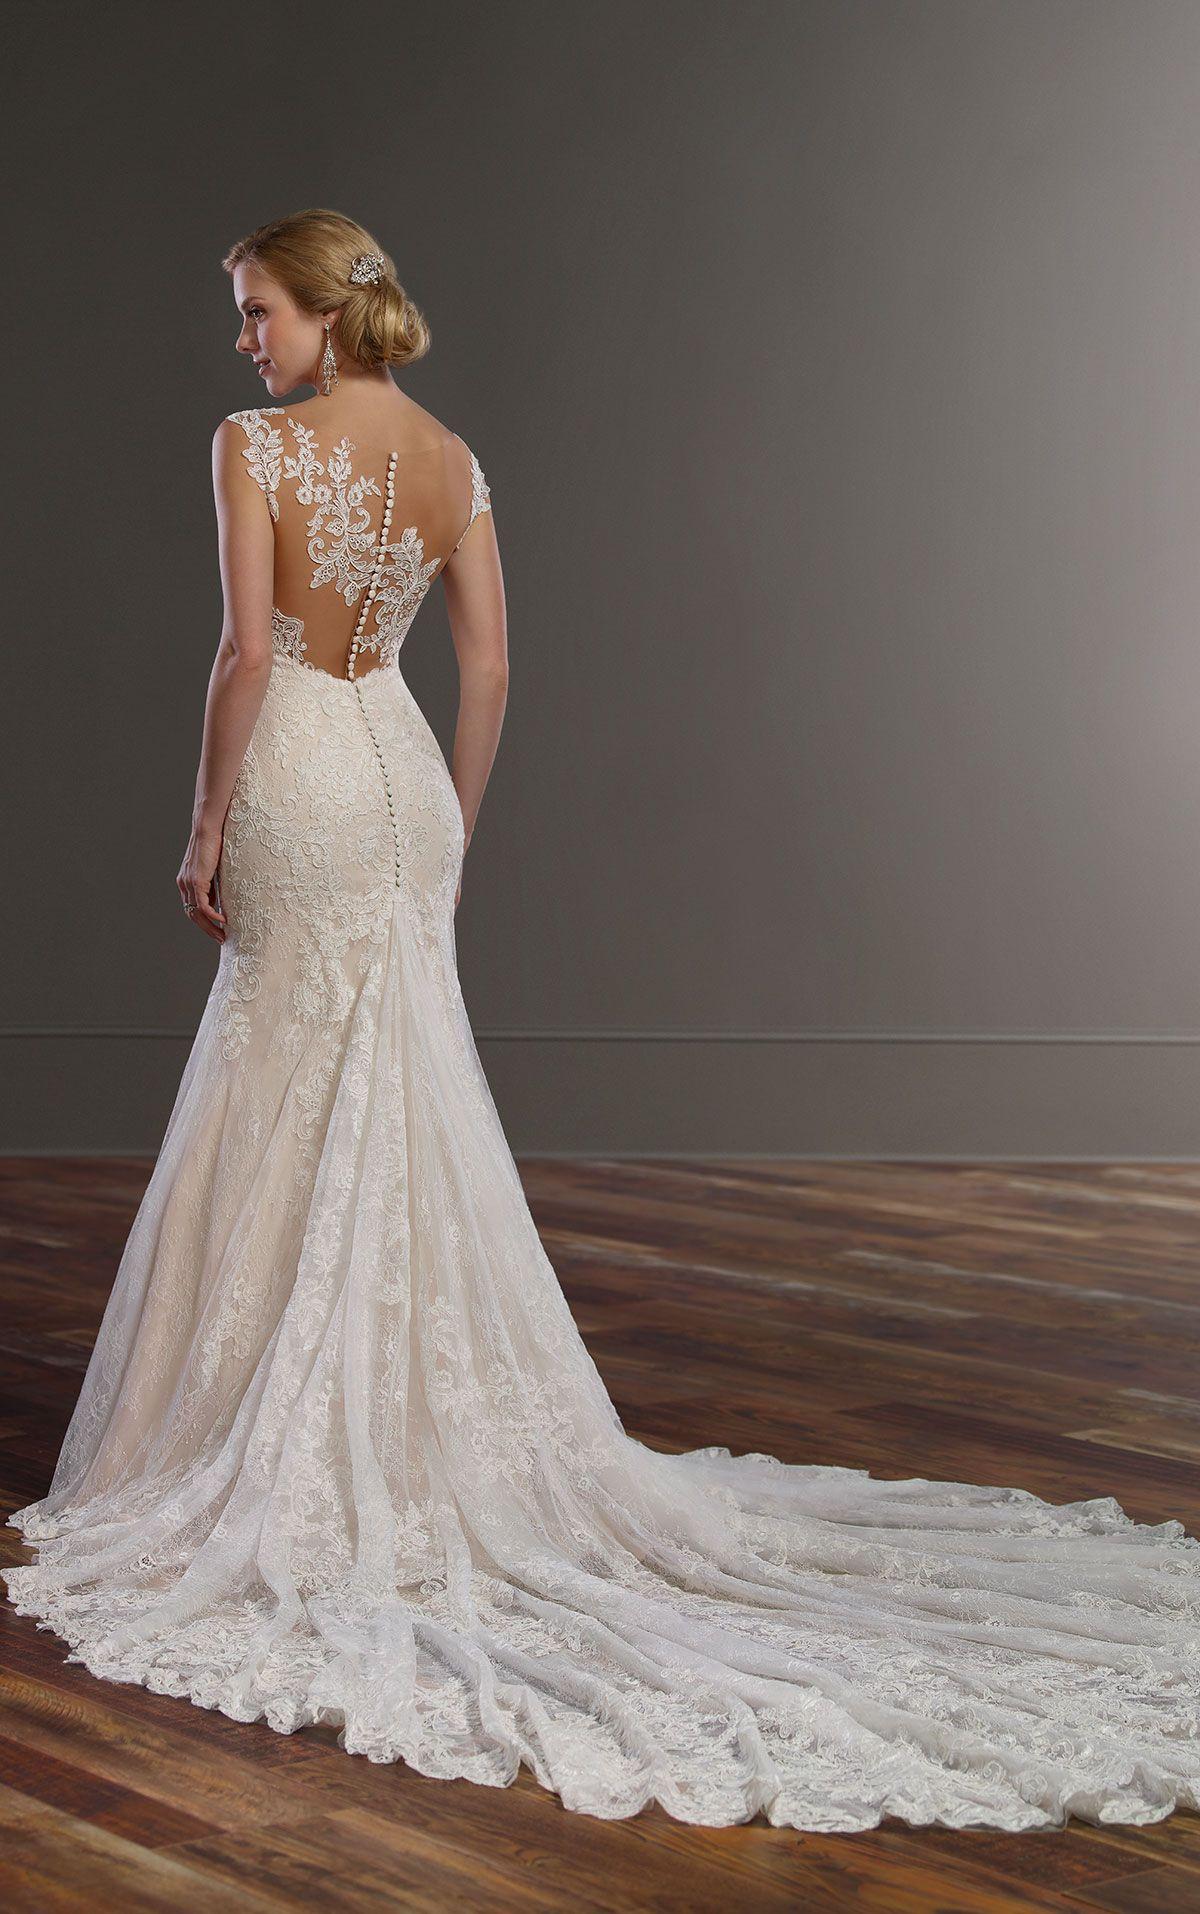 Wedding Gowns Long train wedding dress, Wedding dresses